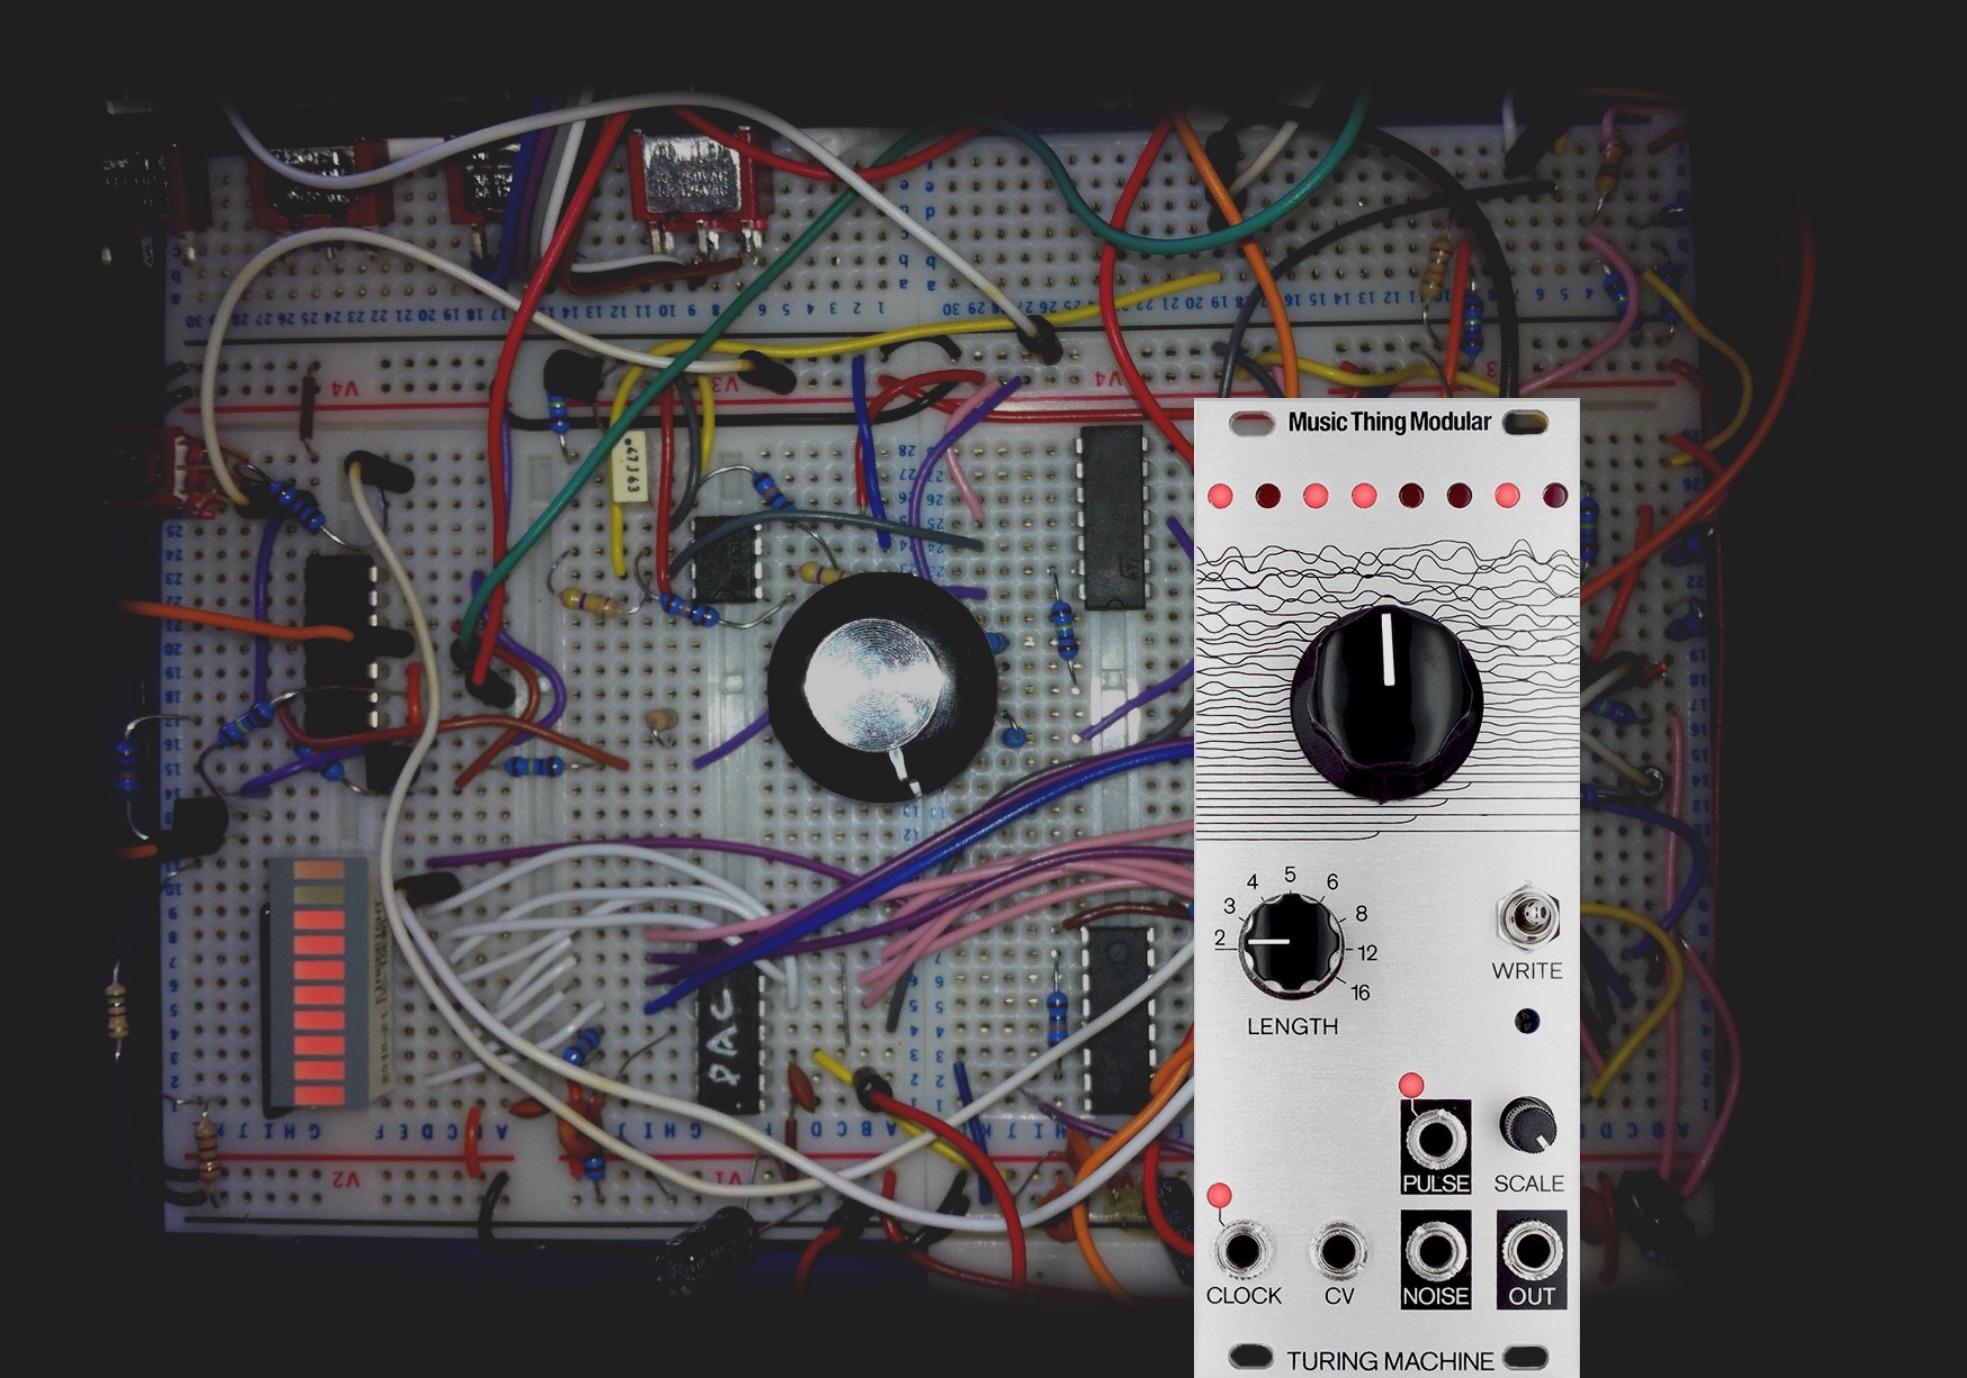 bit by bit, Turing machine - breadboard to eurorack